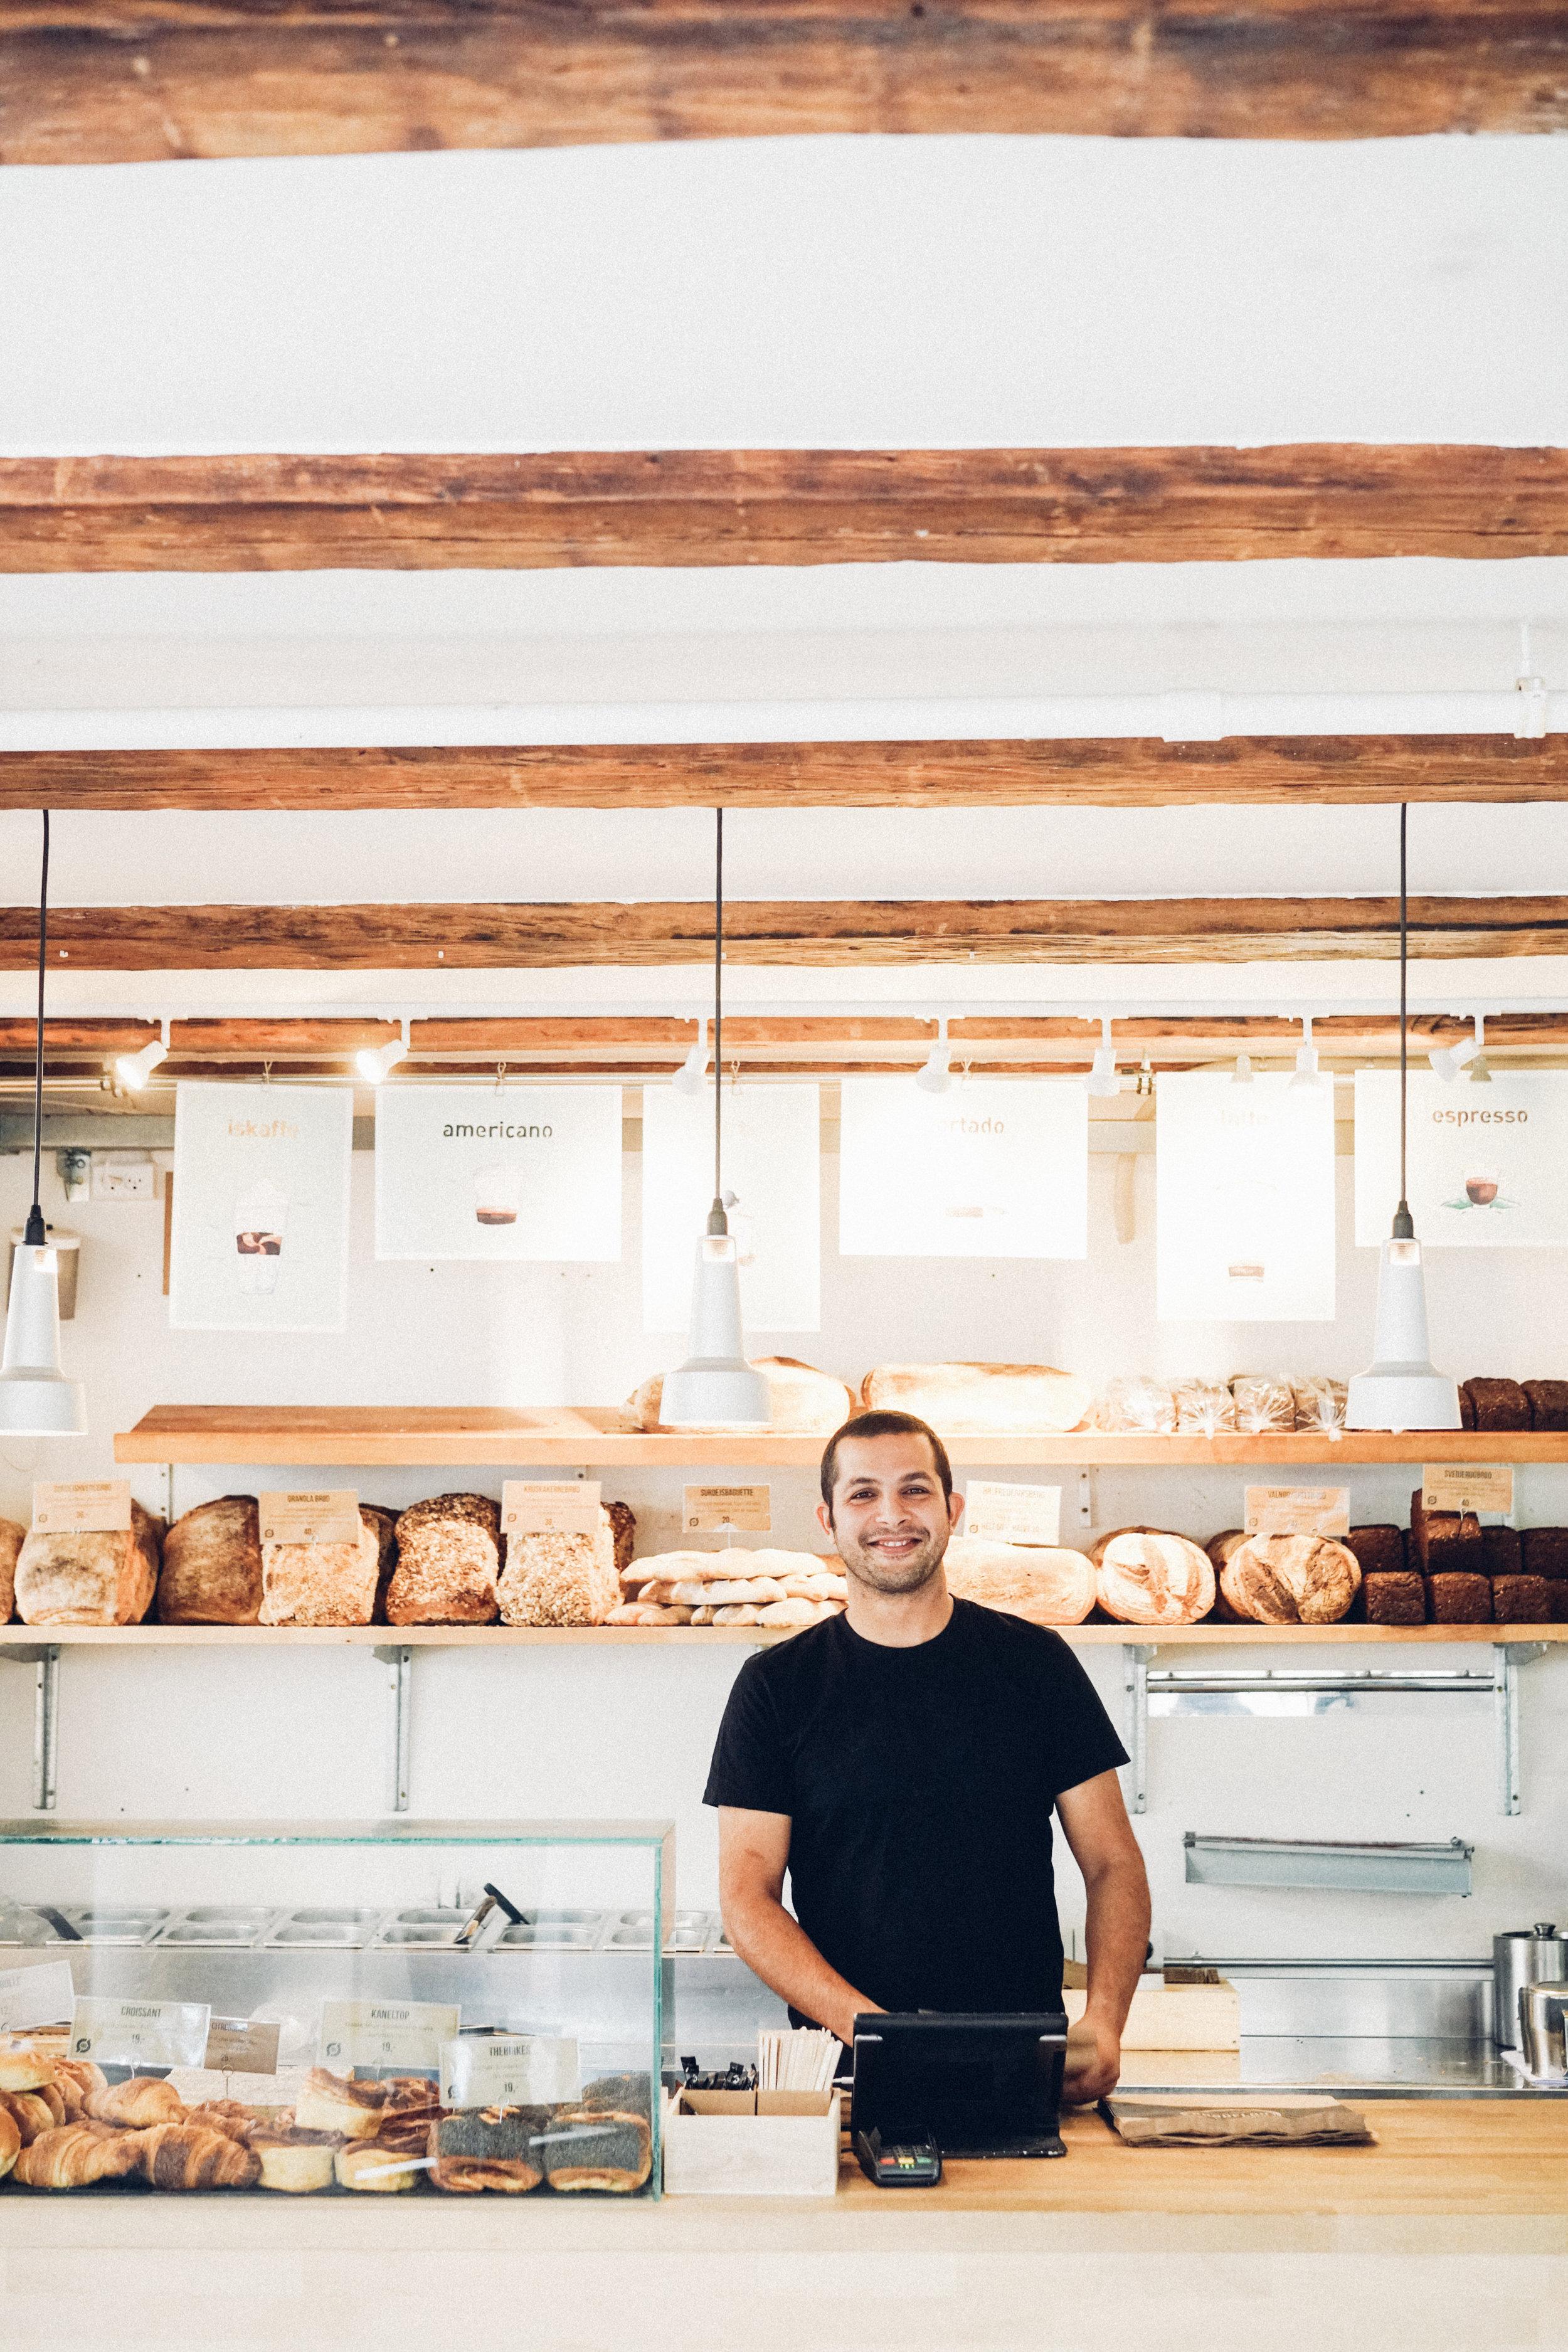 Martin Daniali behind the counter